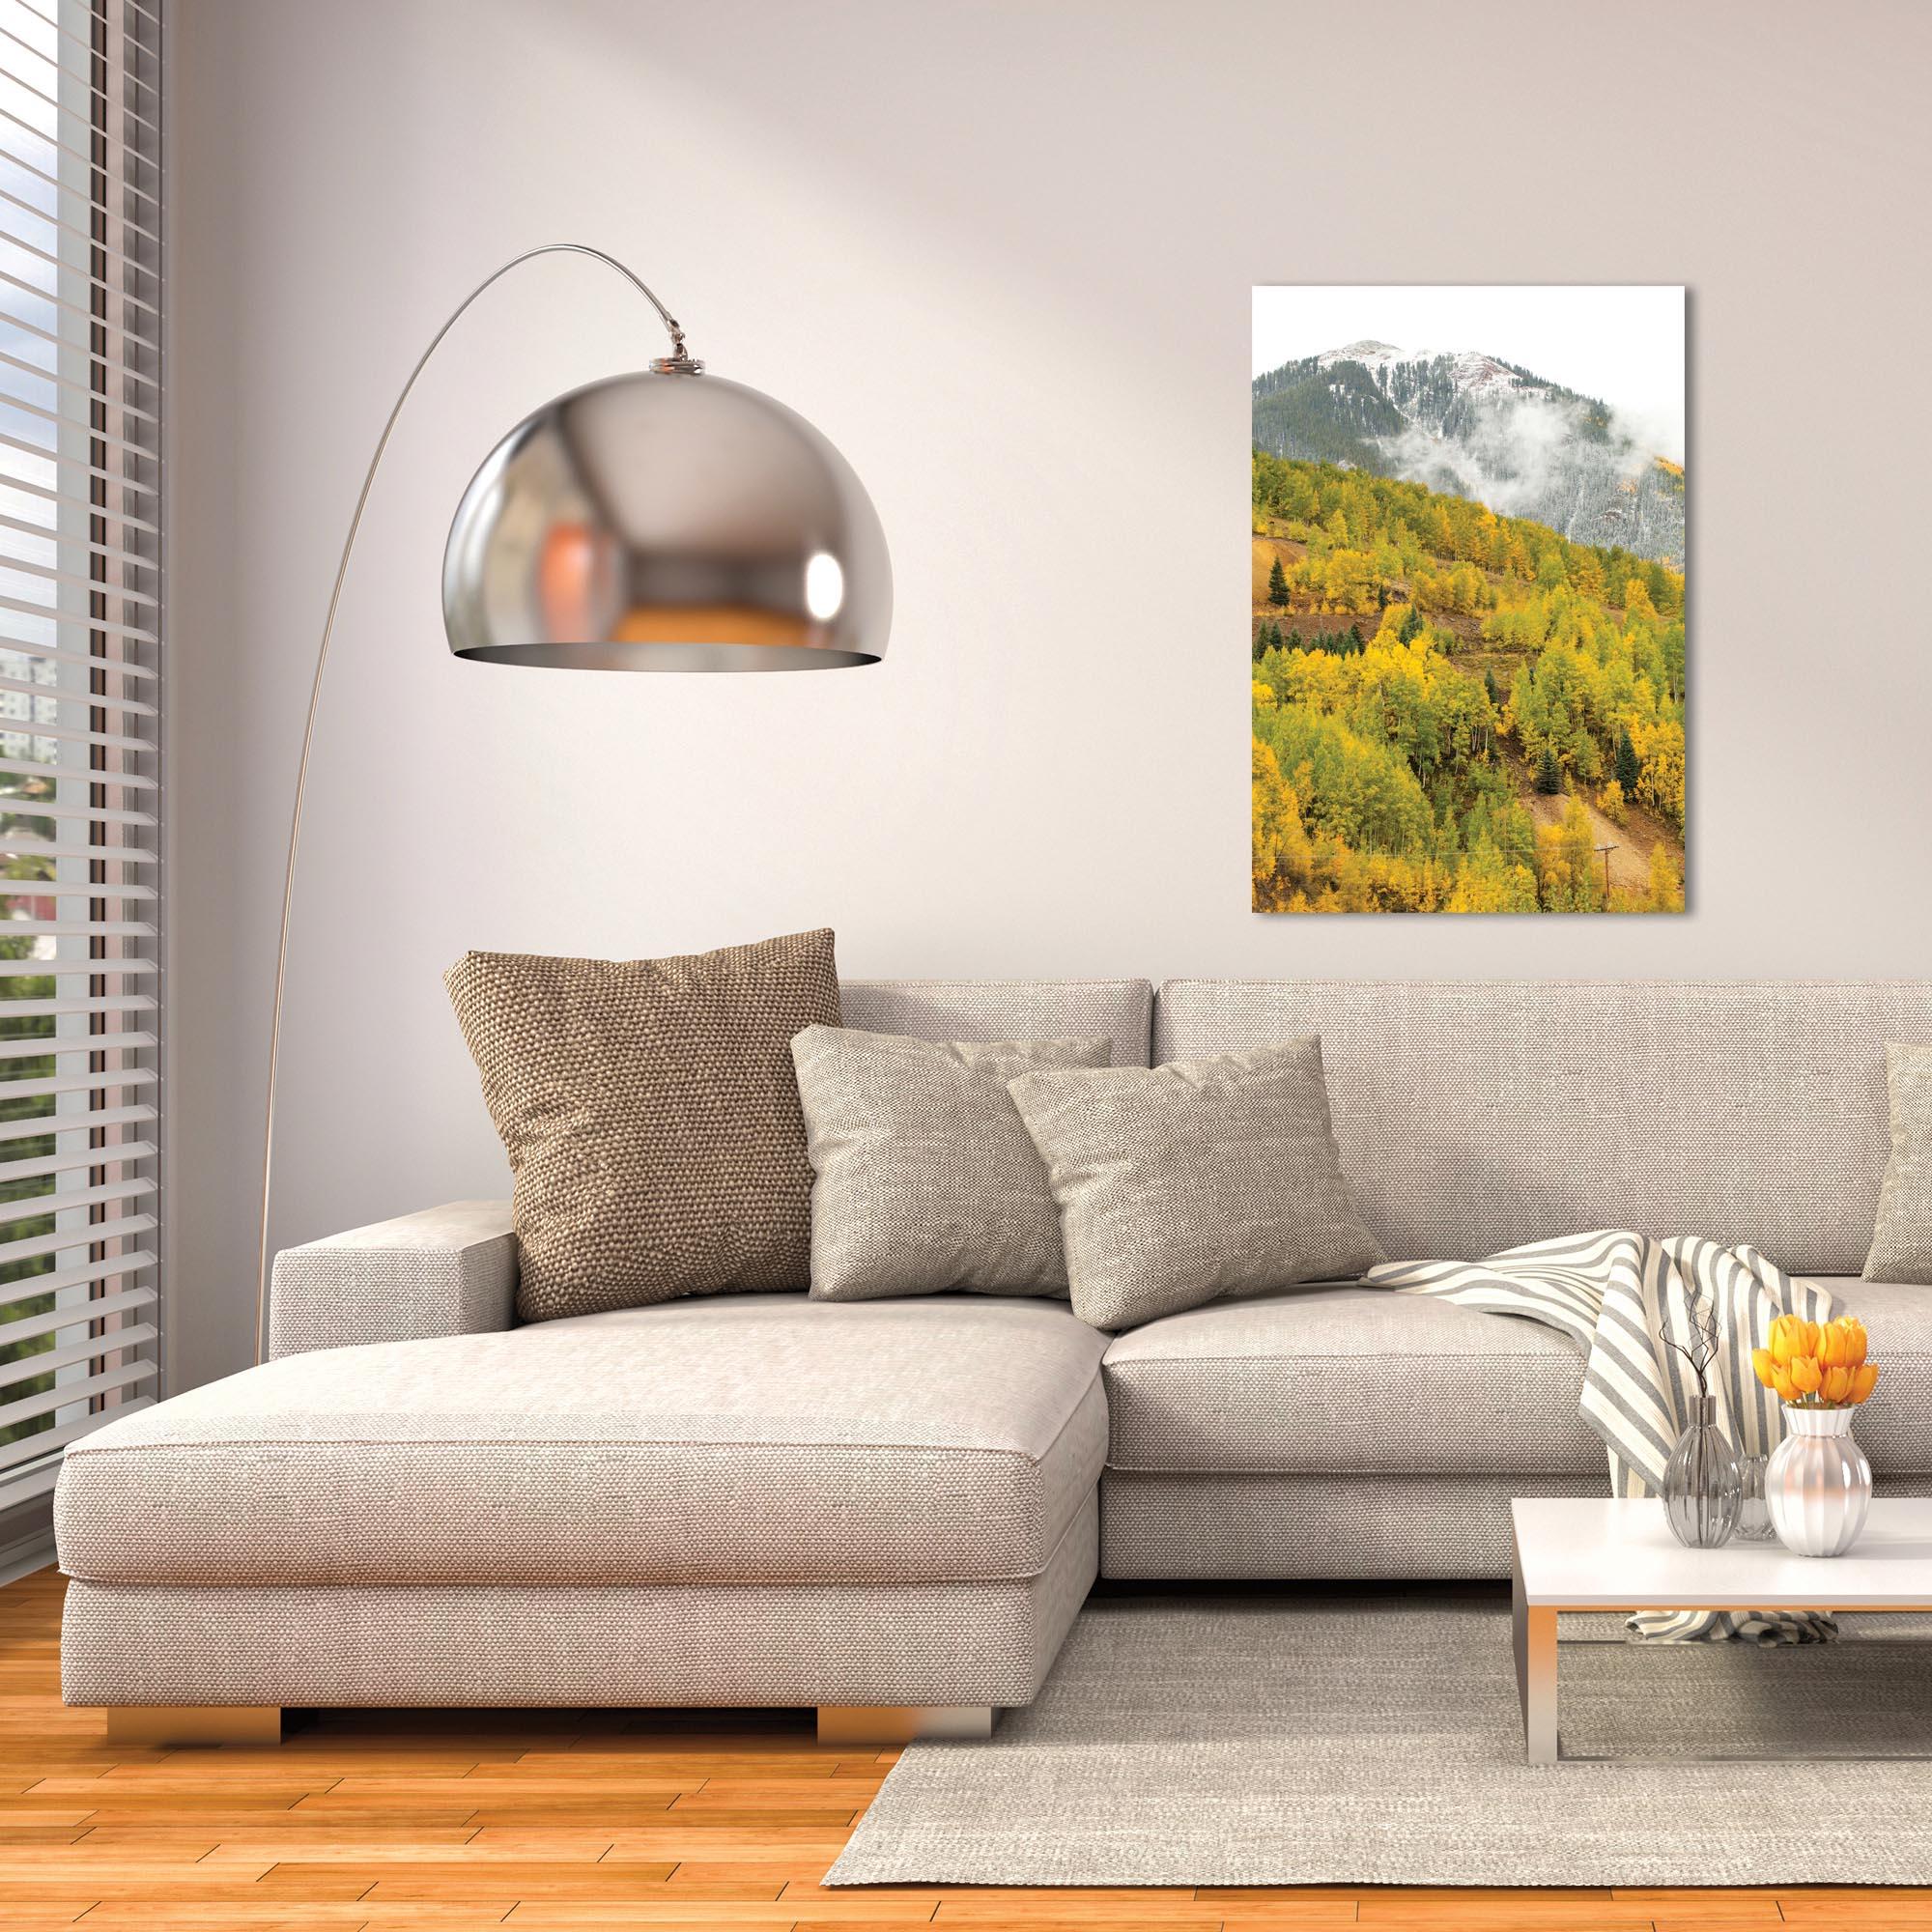 Landscape Photography 'Changing Season' - Autumn Nature Art on Metal or Plexiglass - Lifestyle View